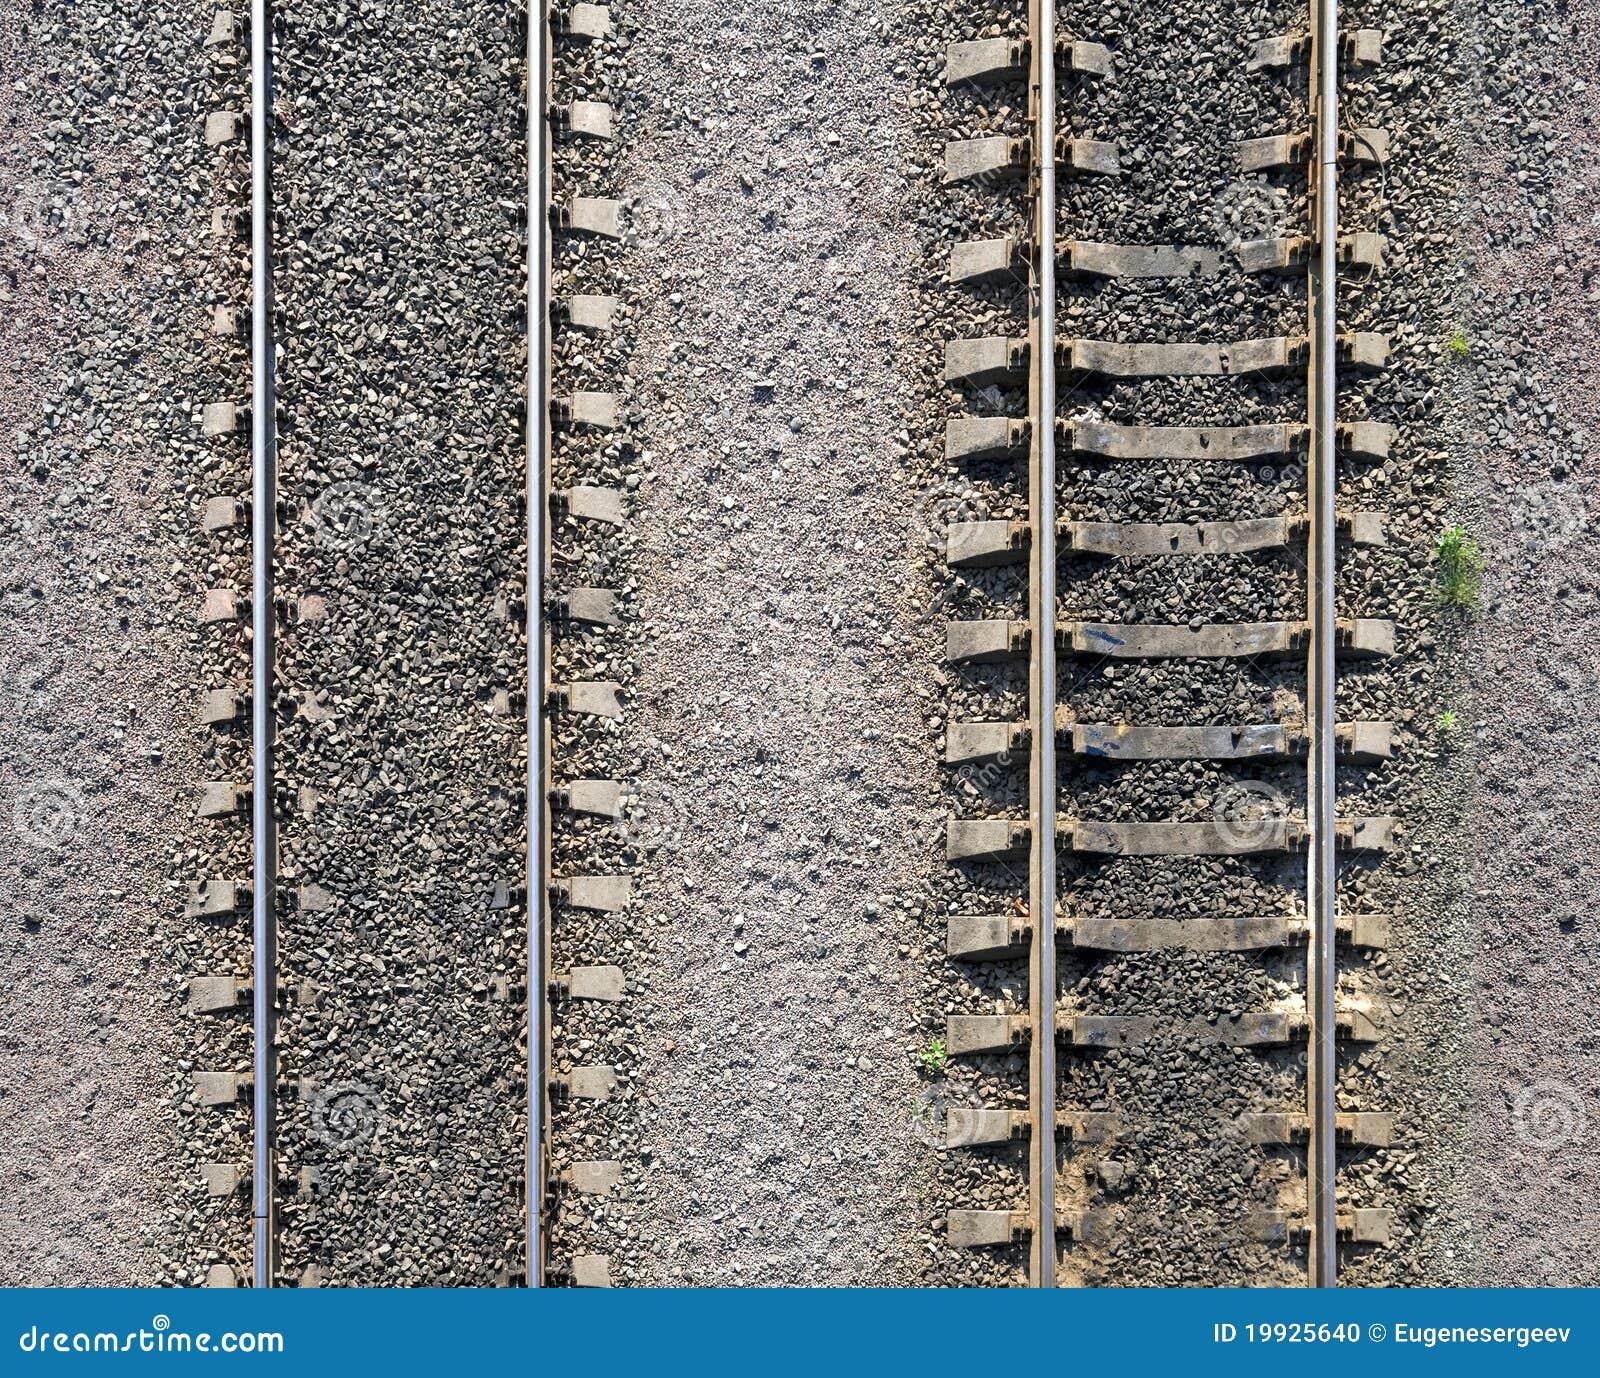 Texture of railway tracks on gravel